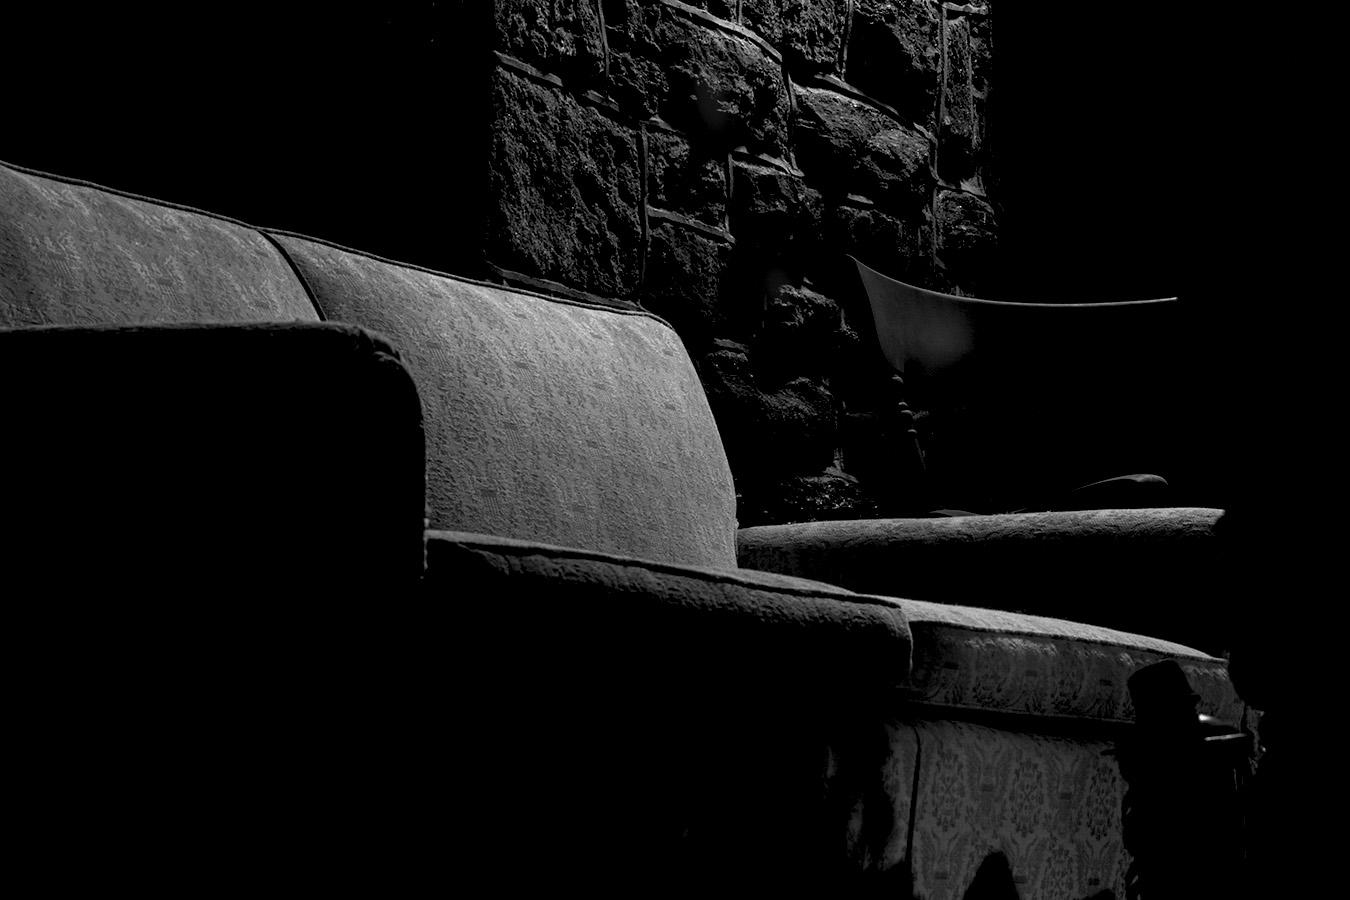 Jesse_Halpern_Still_Life_Porch_Couch_Night